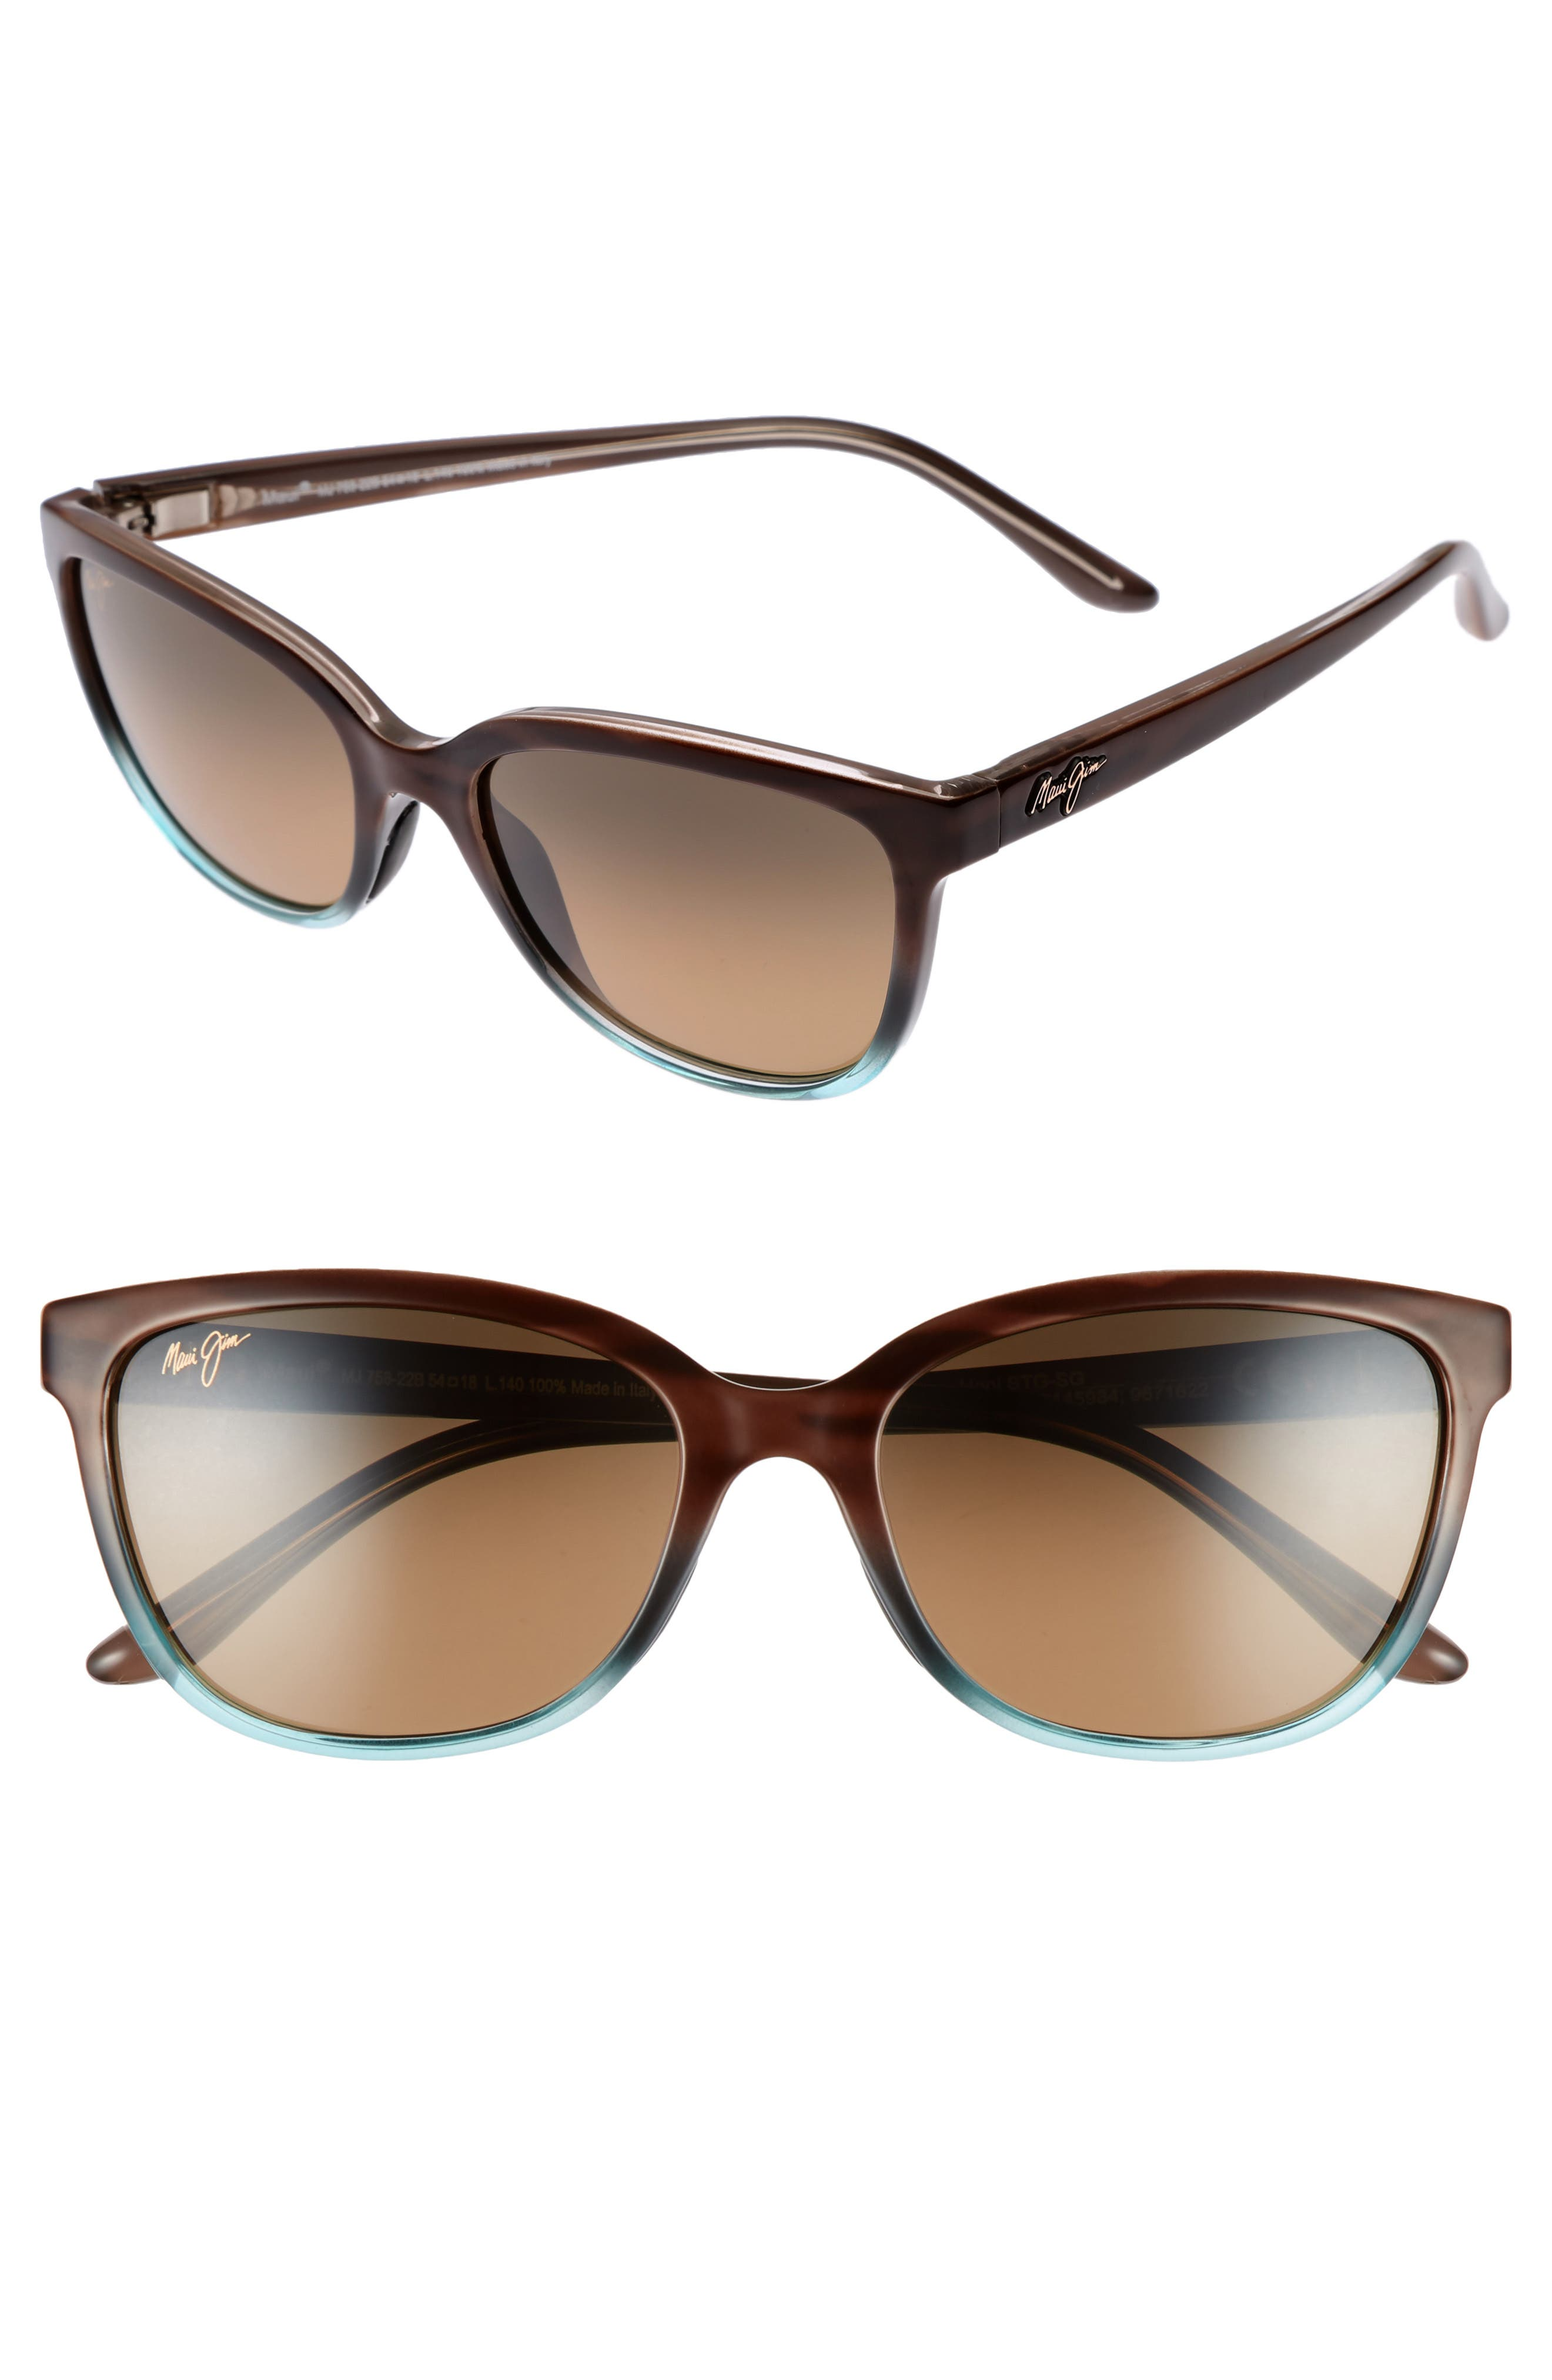 Honi 54mm Polarizedplus2 Cat Eye Sunglasses